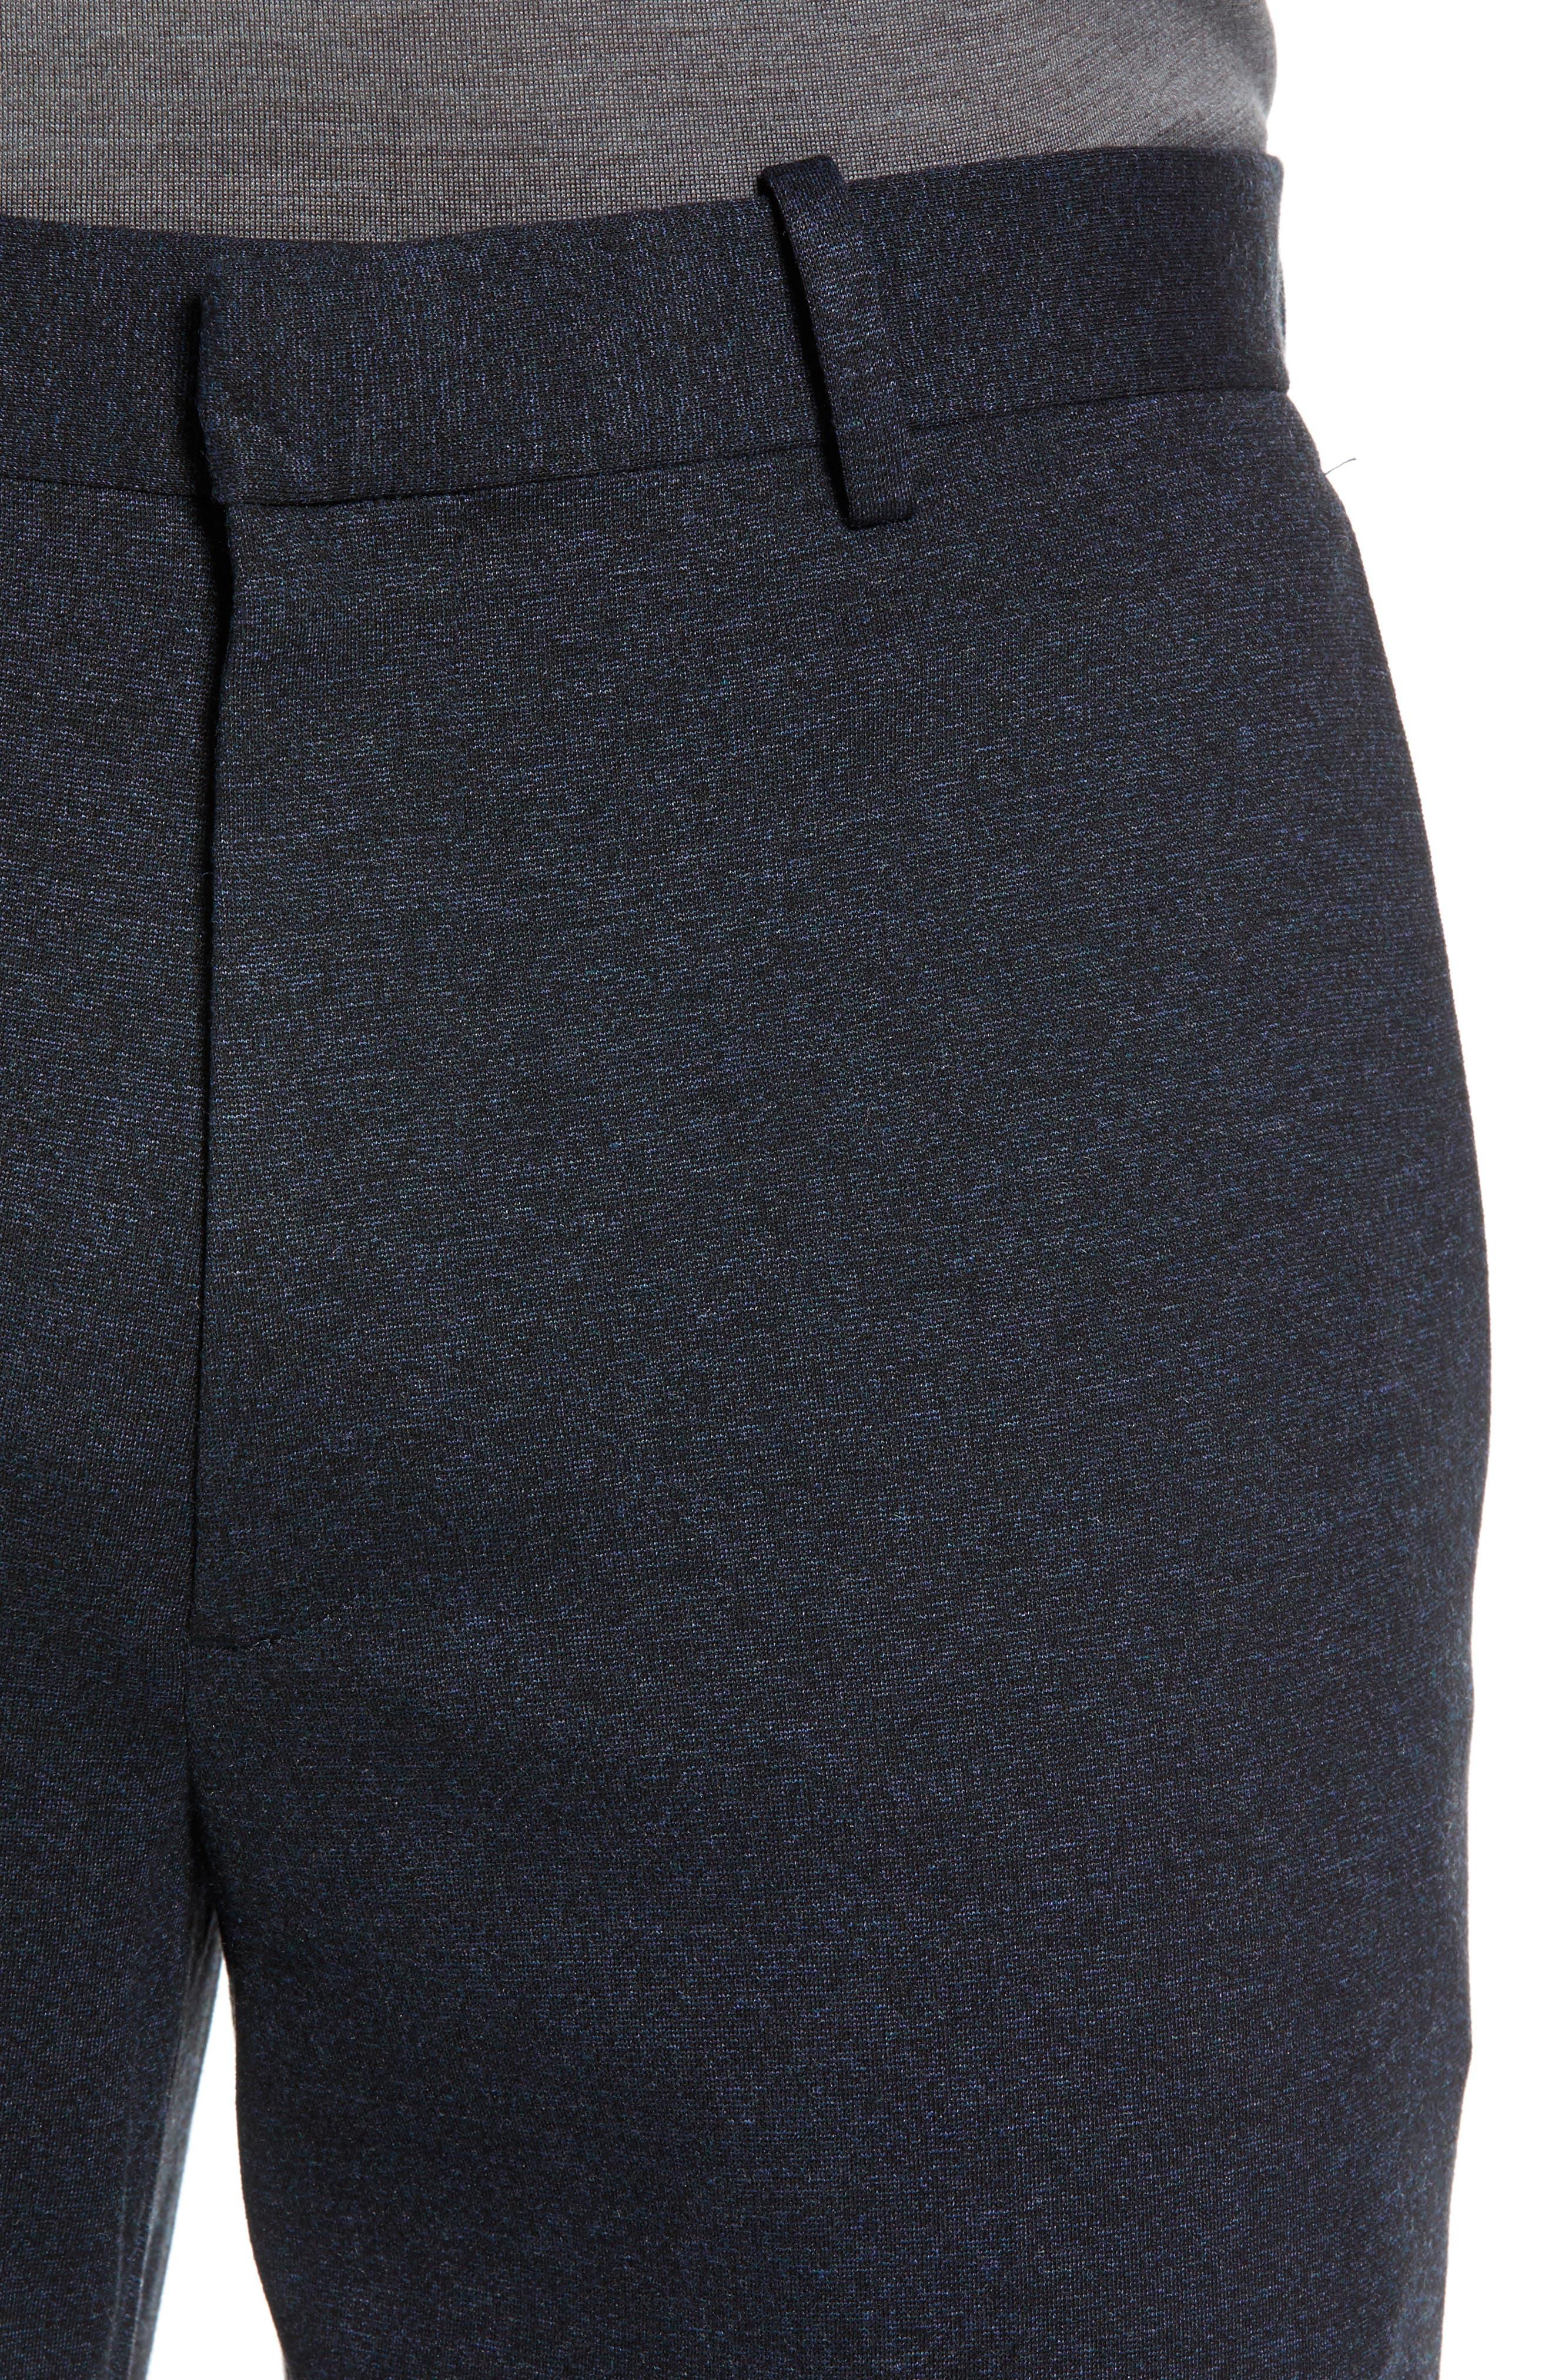 Payton Marled Ponte Trousers,                             Alternate thumbnail 4, color,                             ECLIPSE MELANGE